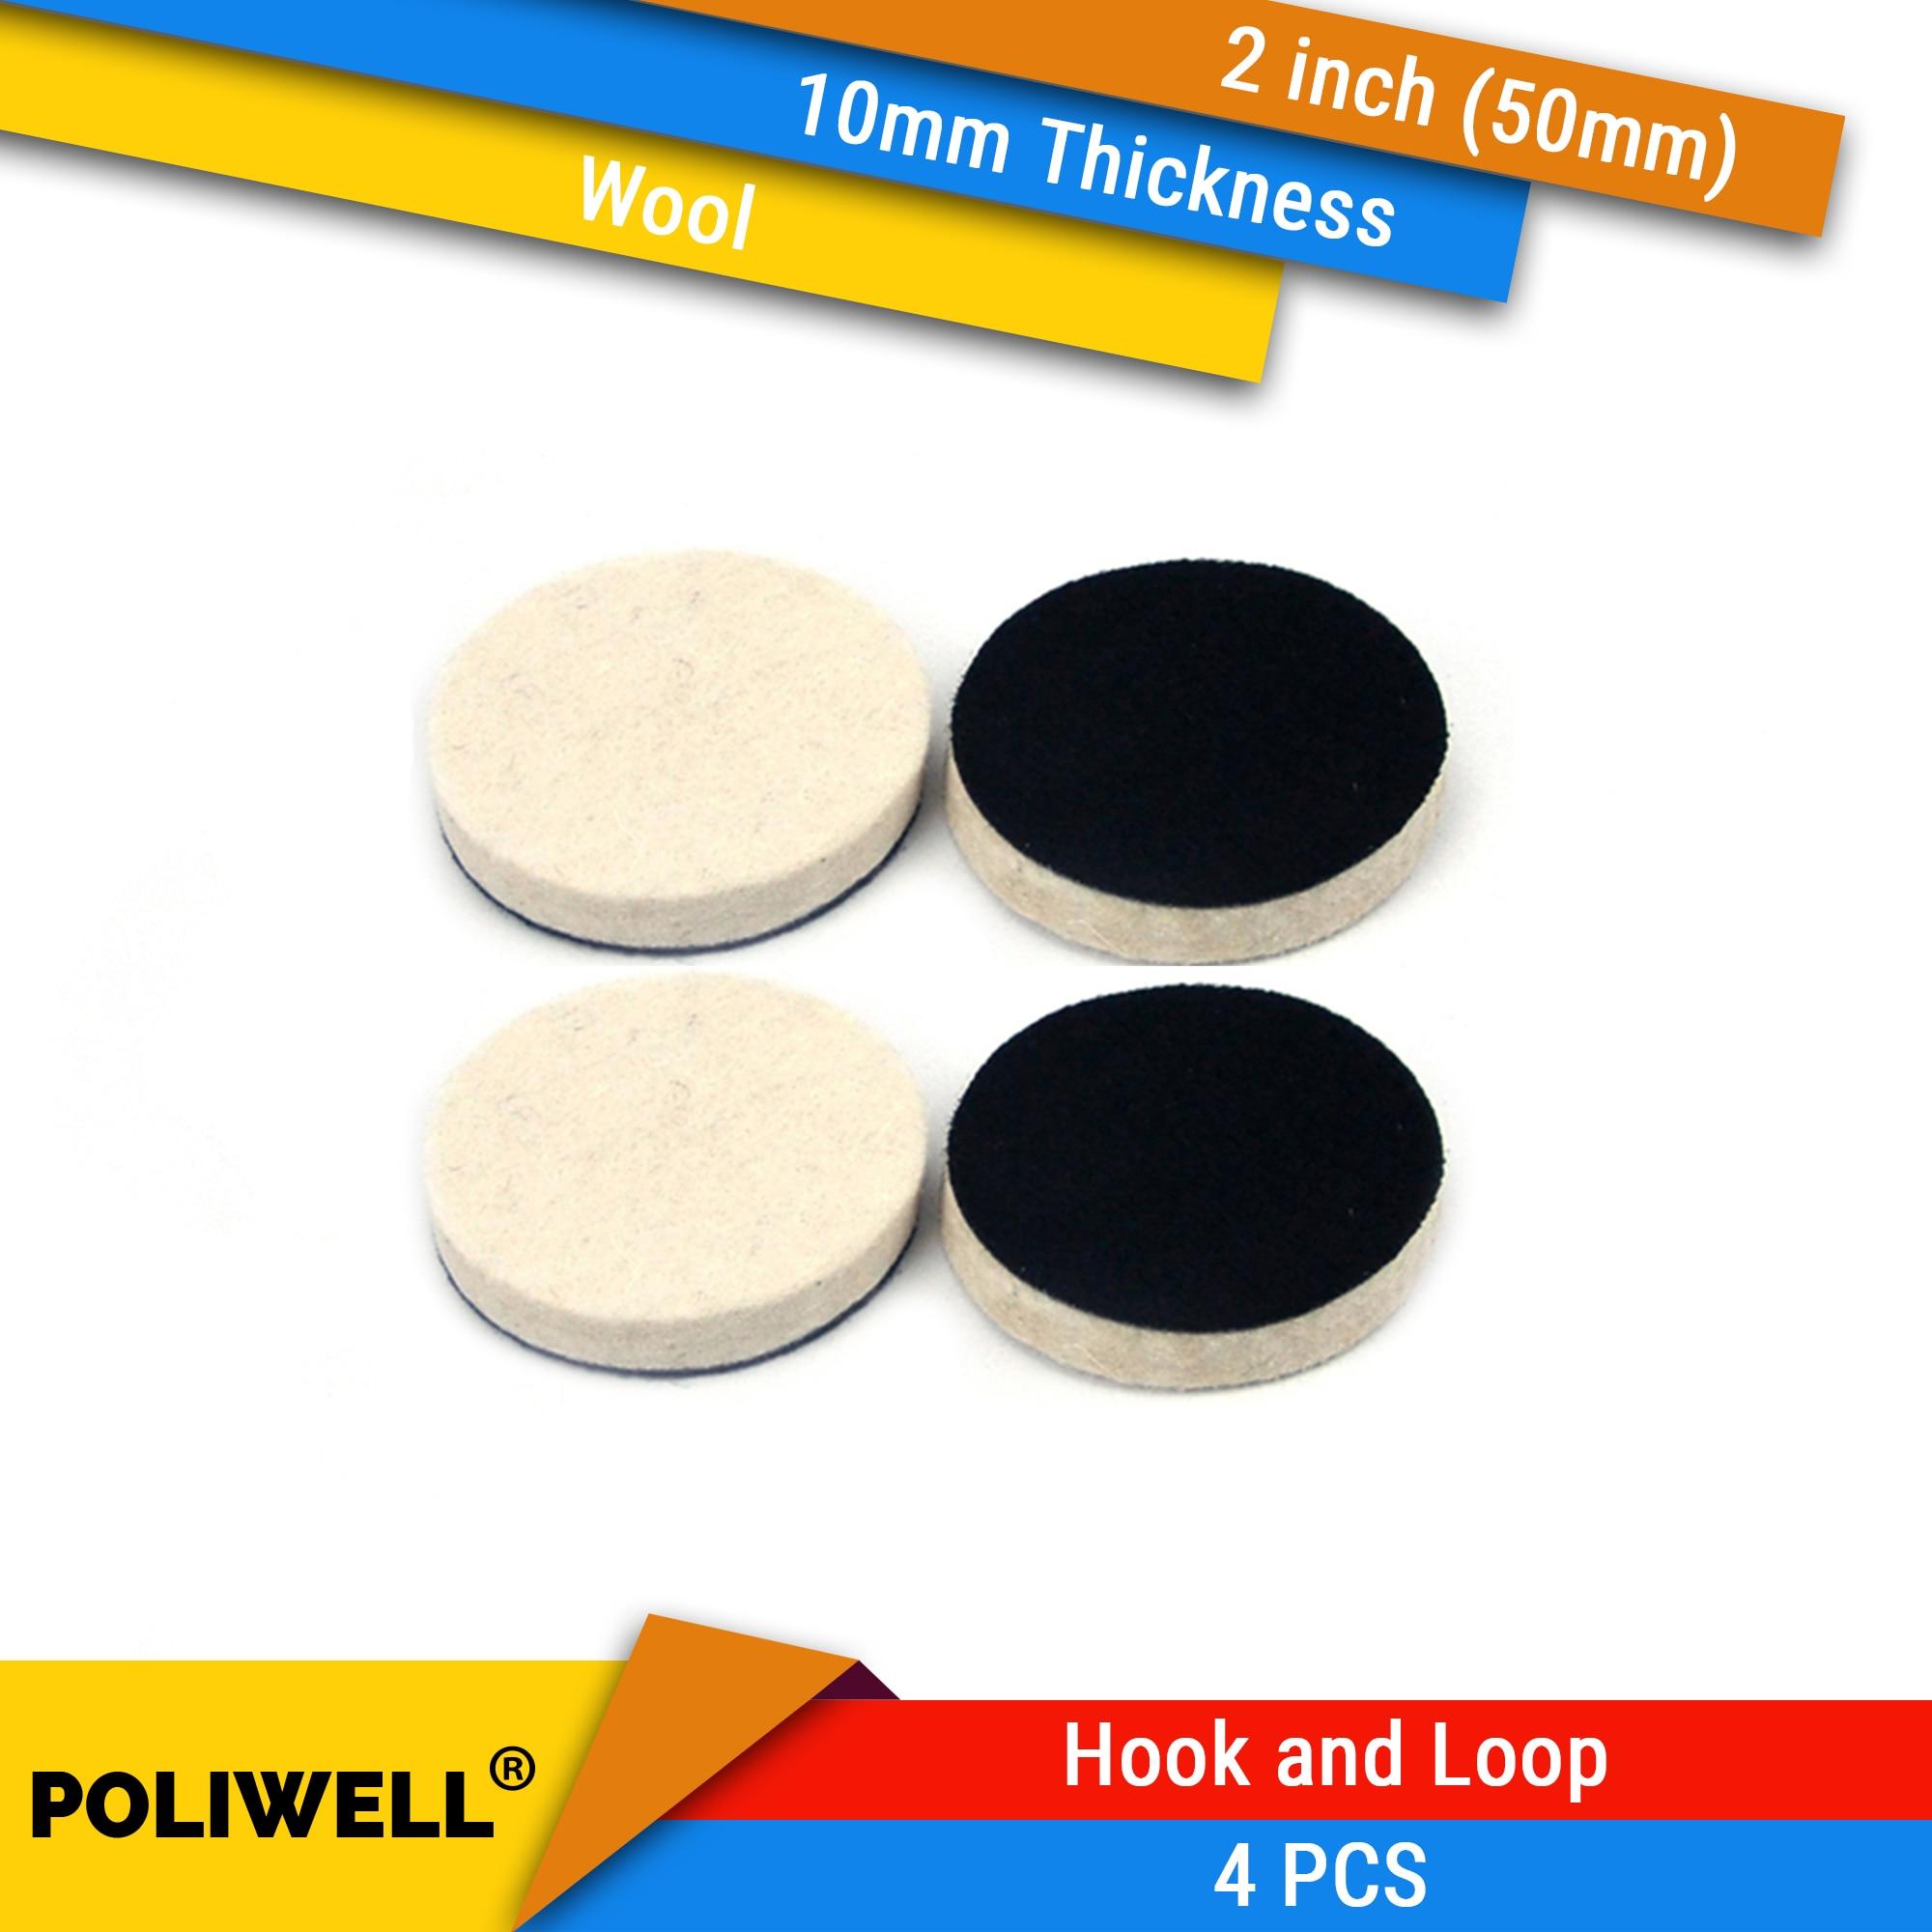 4PCS 2 Inch 50mm Round Wool Polishing Disc Flocking Backing For Sanding Pad Car Metal Grinding Polishing Power Tools Accessories